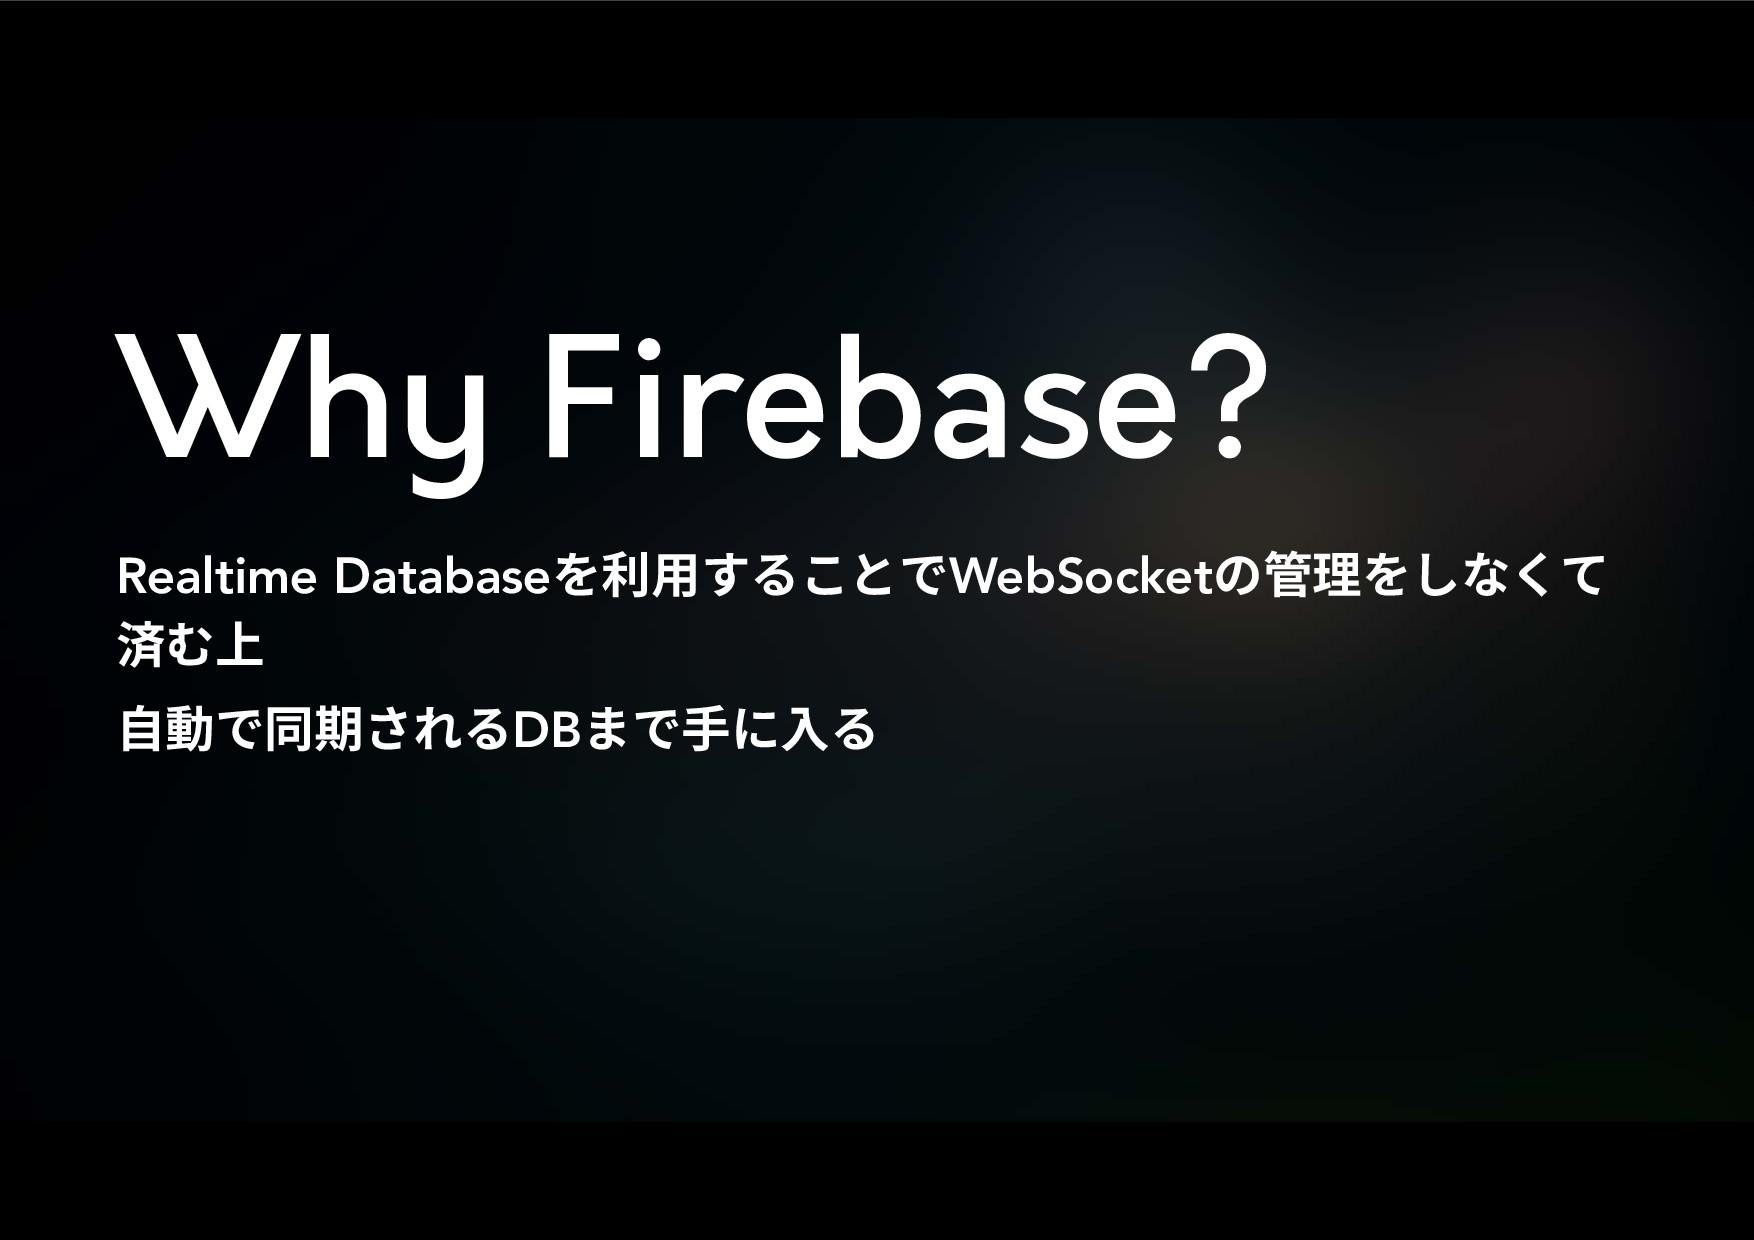 Why Firebase? Realtime Databaseⵃ欽ֿׅהדWebSock...